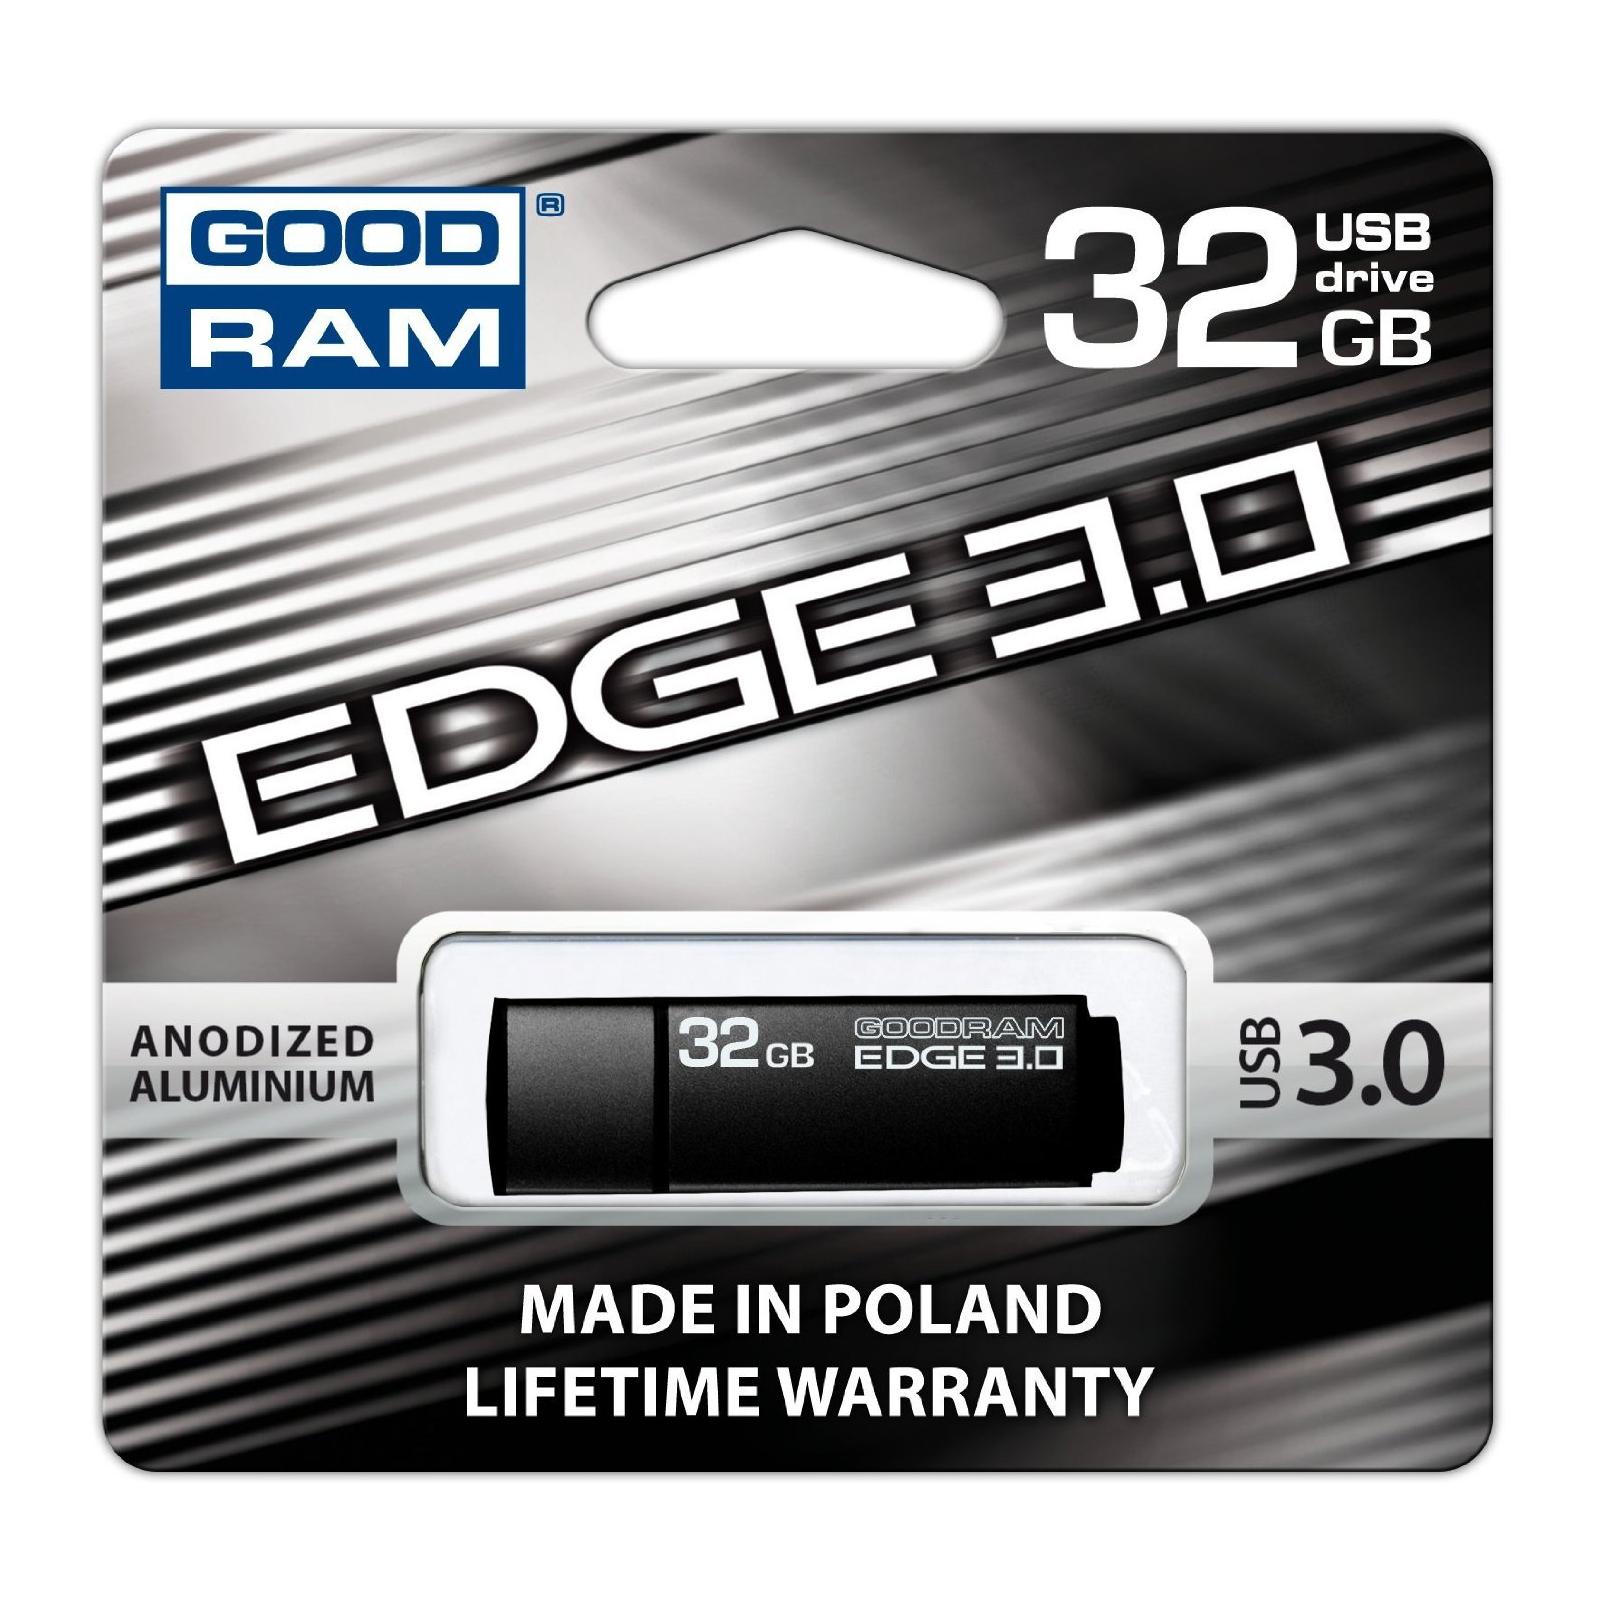 USB флеш накопитель Goodram 8Gb Edge (PD8GH2GREGRR9) изображение 3